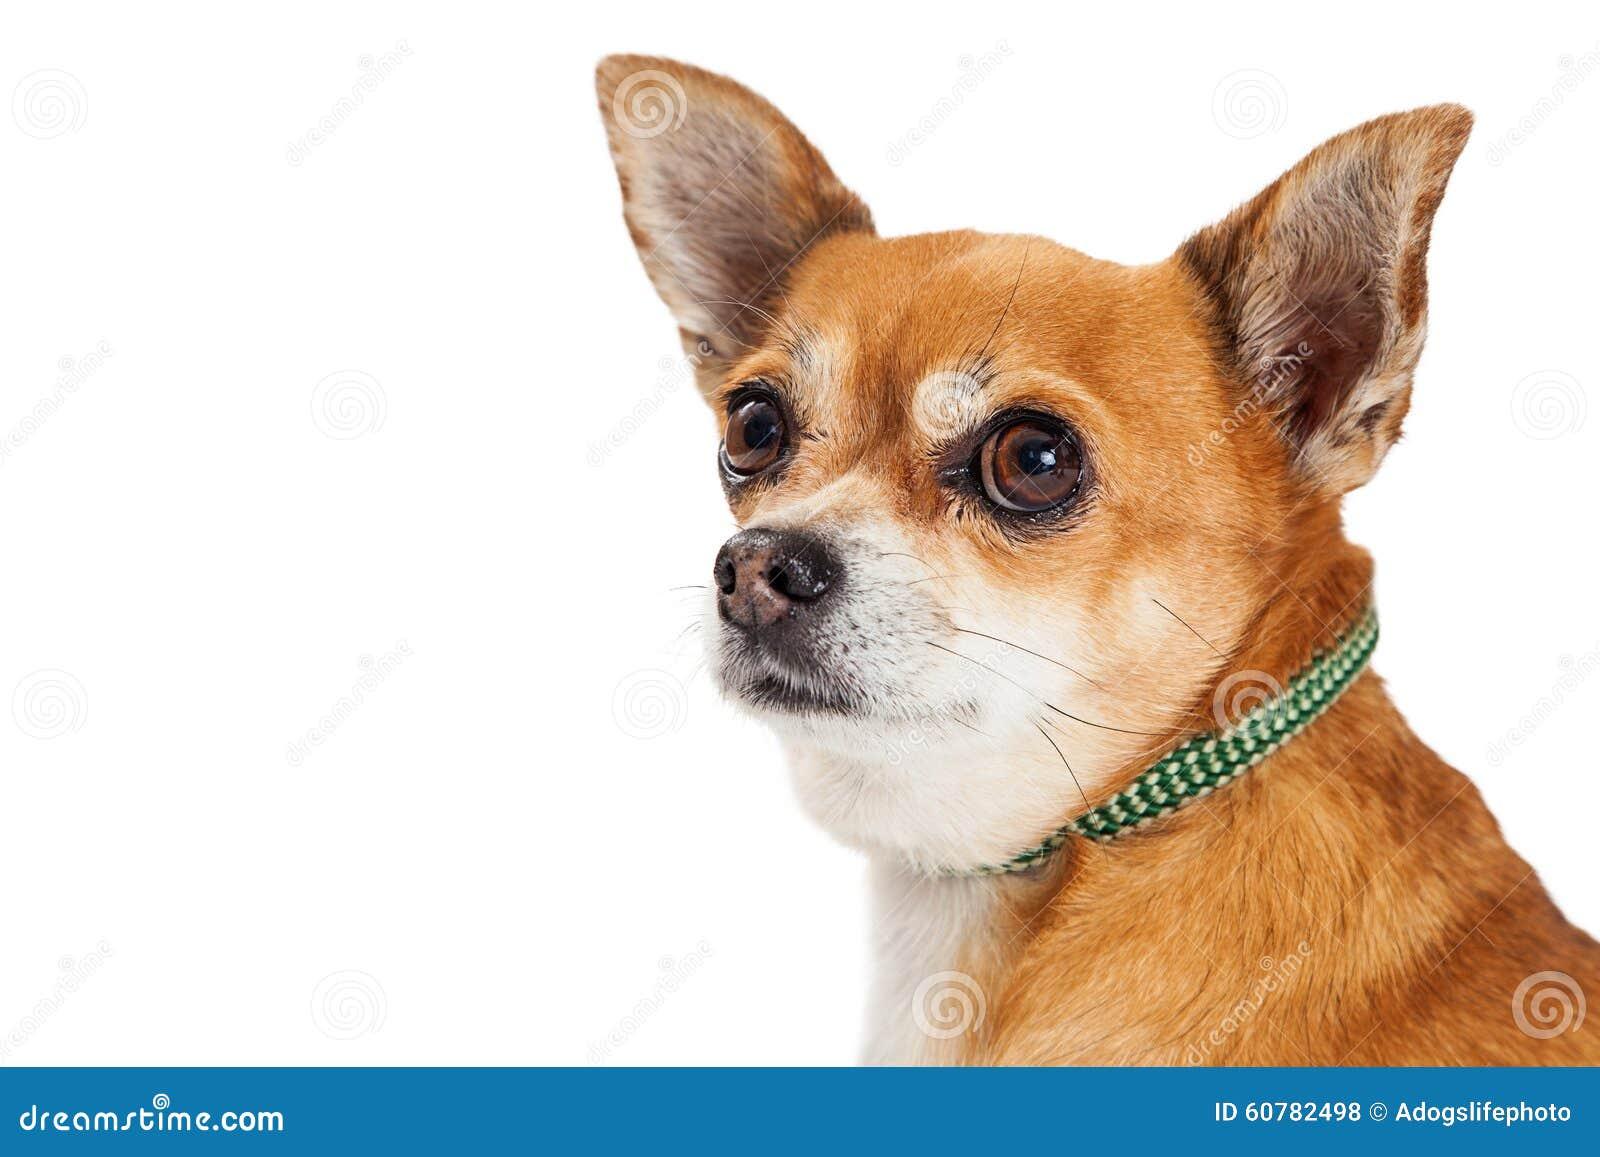 Chihuahua Mixed Breed Dog Profile Closeup Stock Photo ...